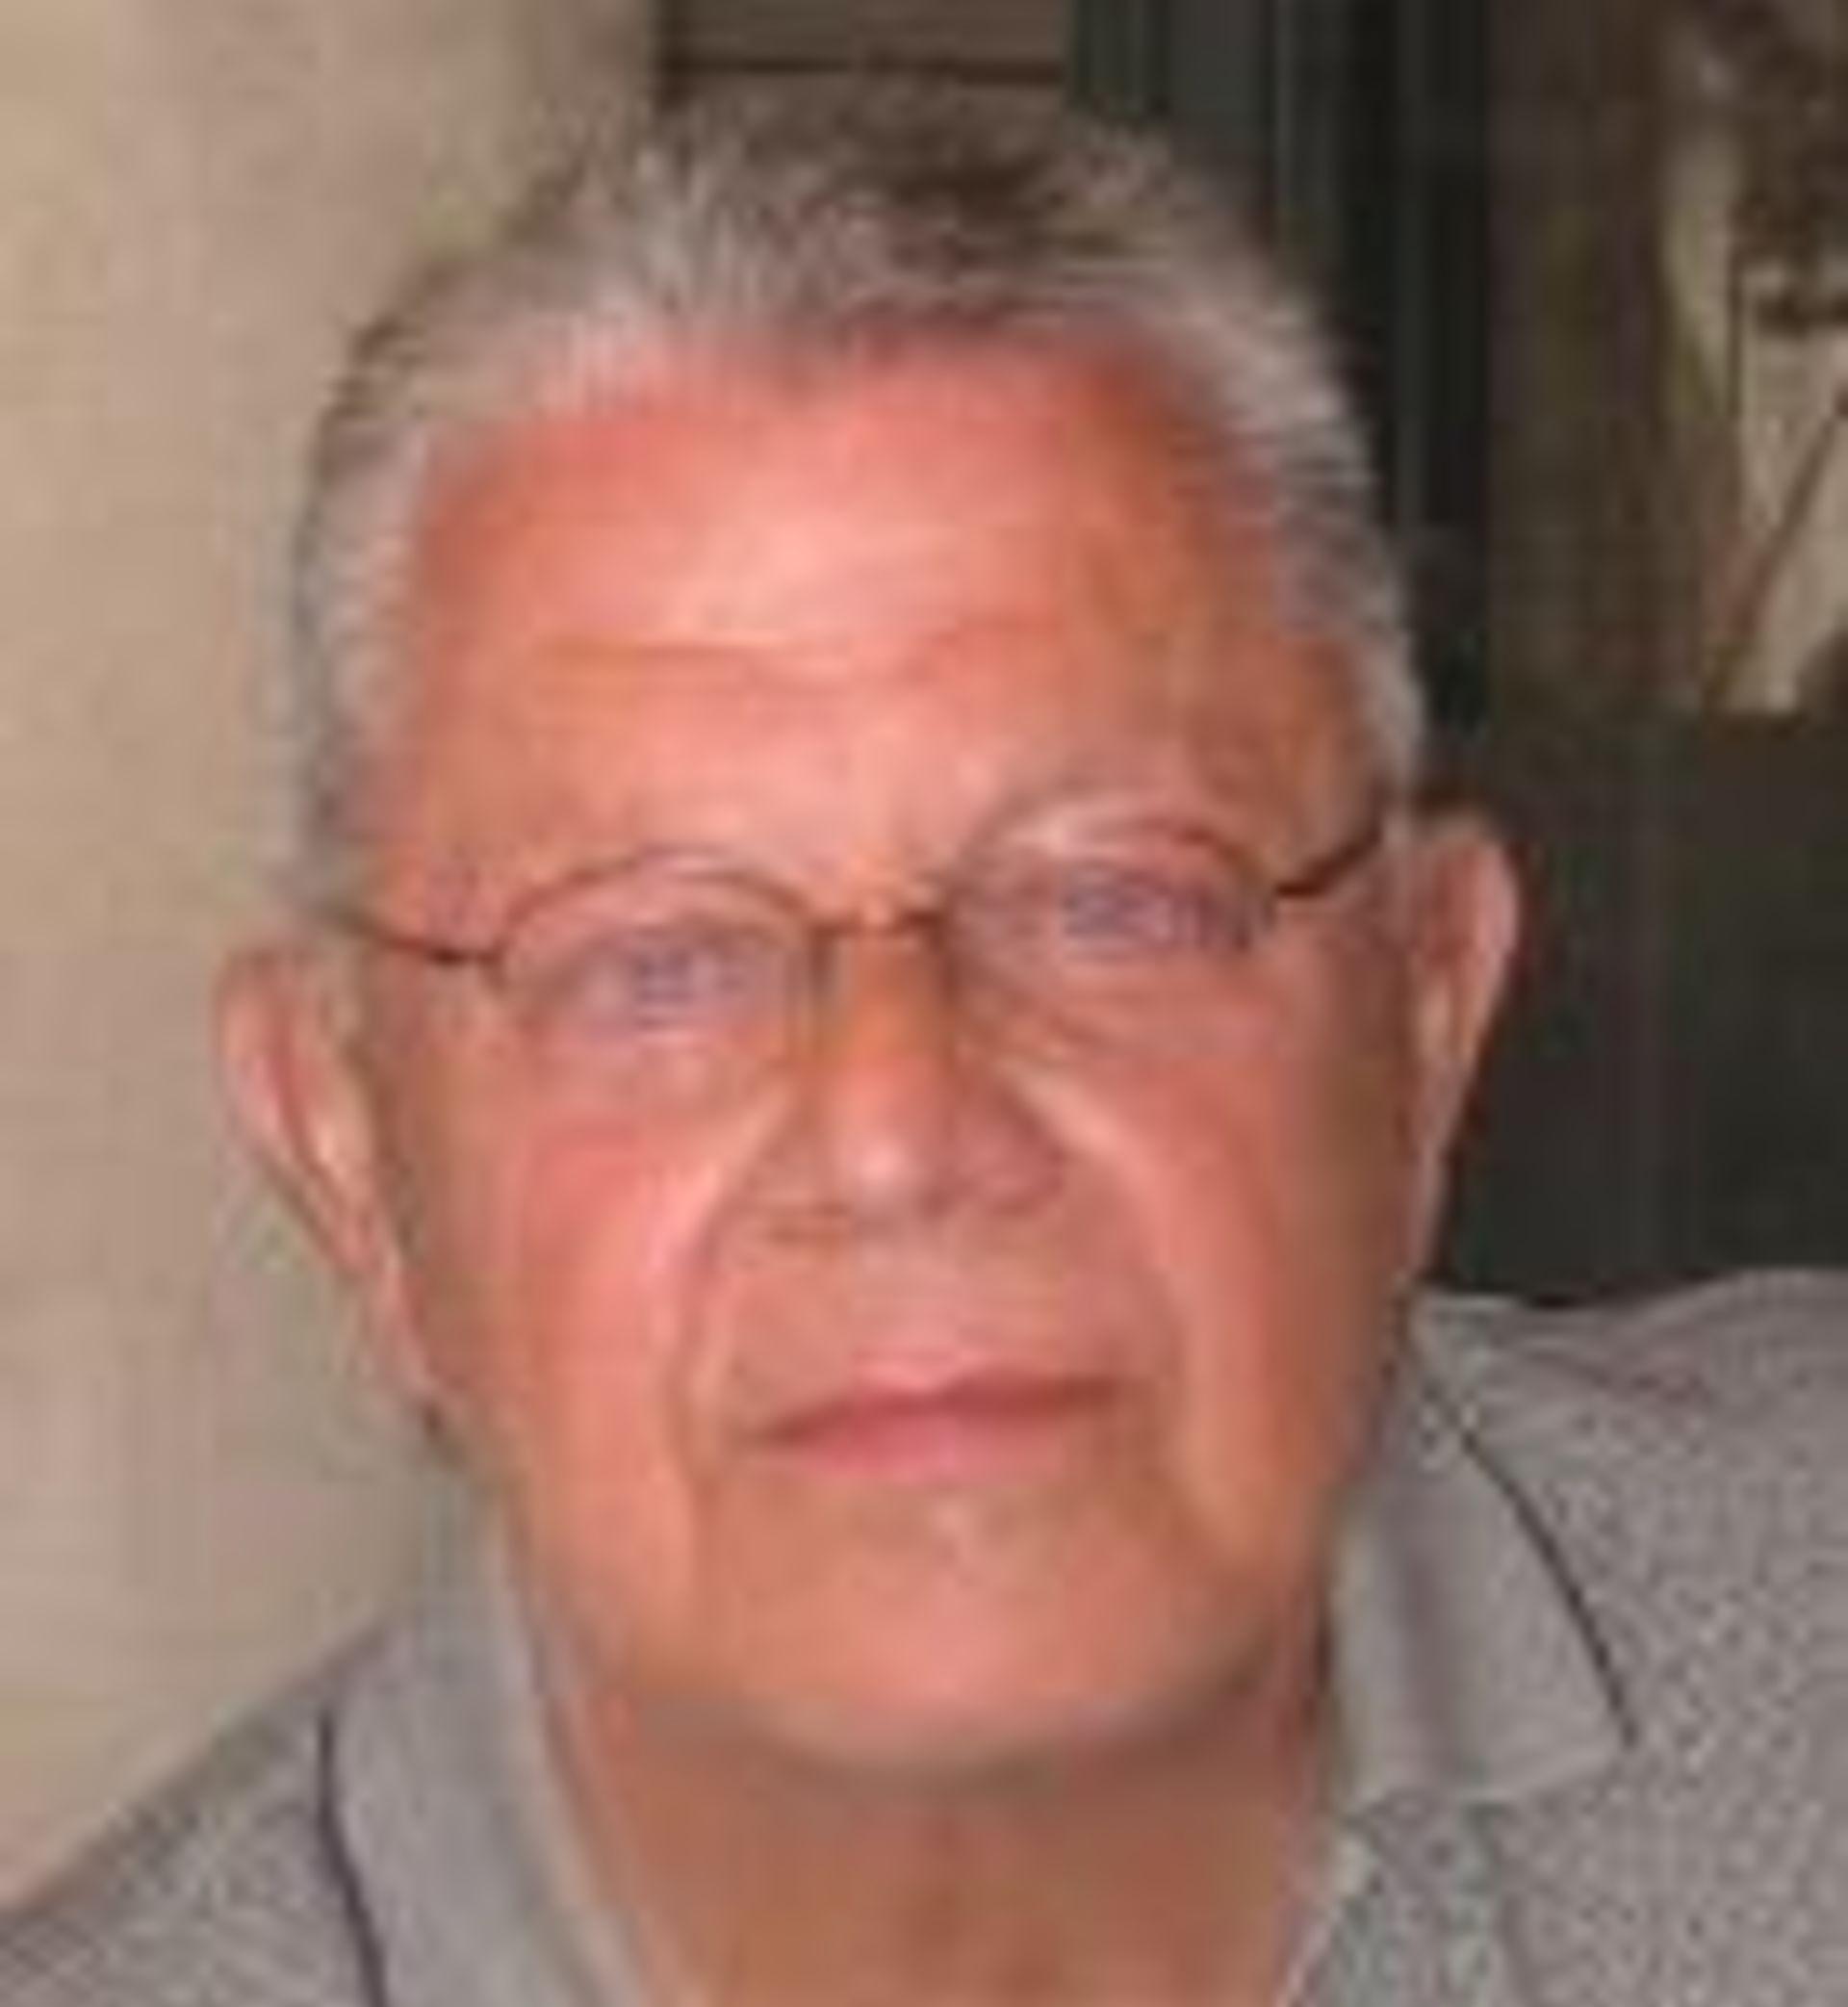 Gerry Mostowy